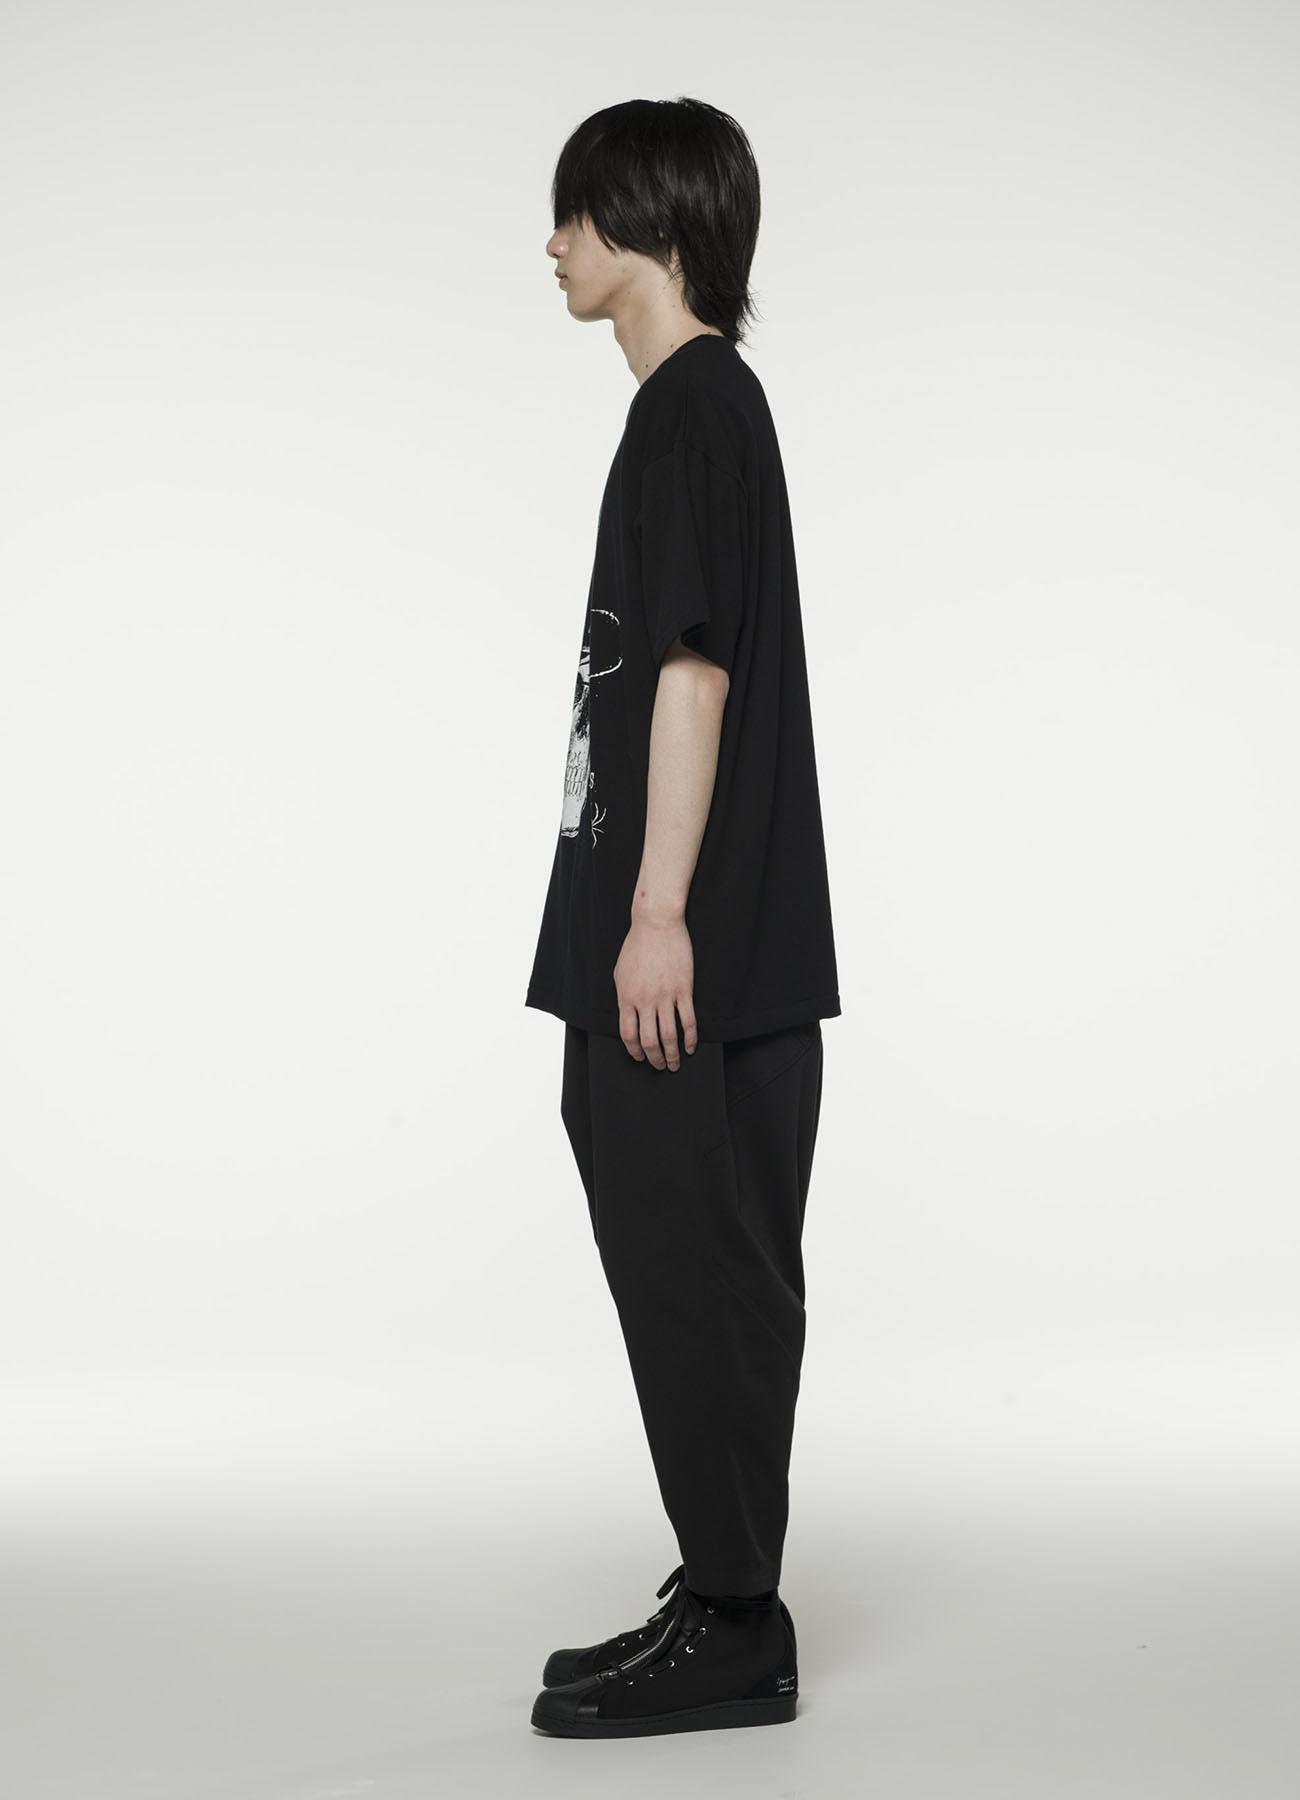 20/CottonJersey Silk hat Skull T-shirt